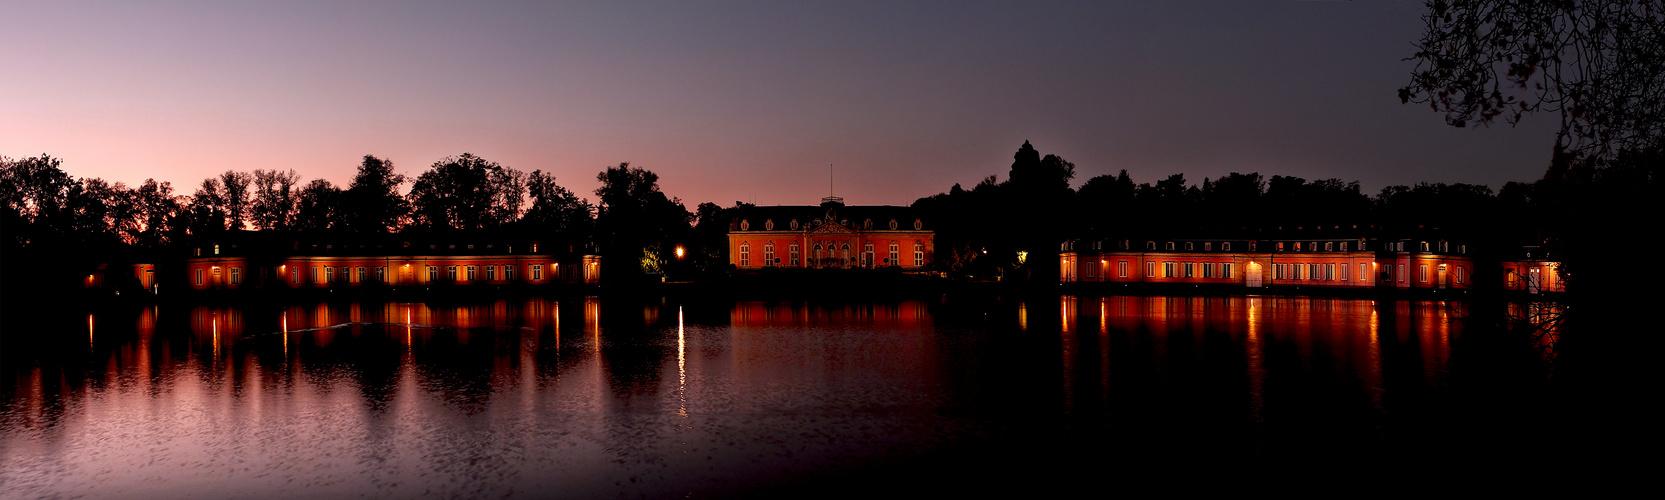 Schloss Benrath vorm Sonnenaufgang